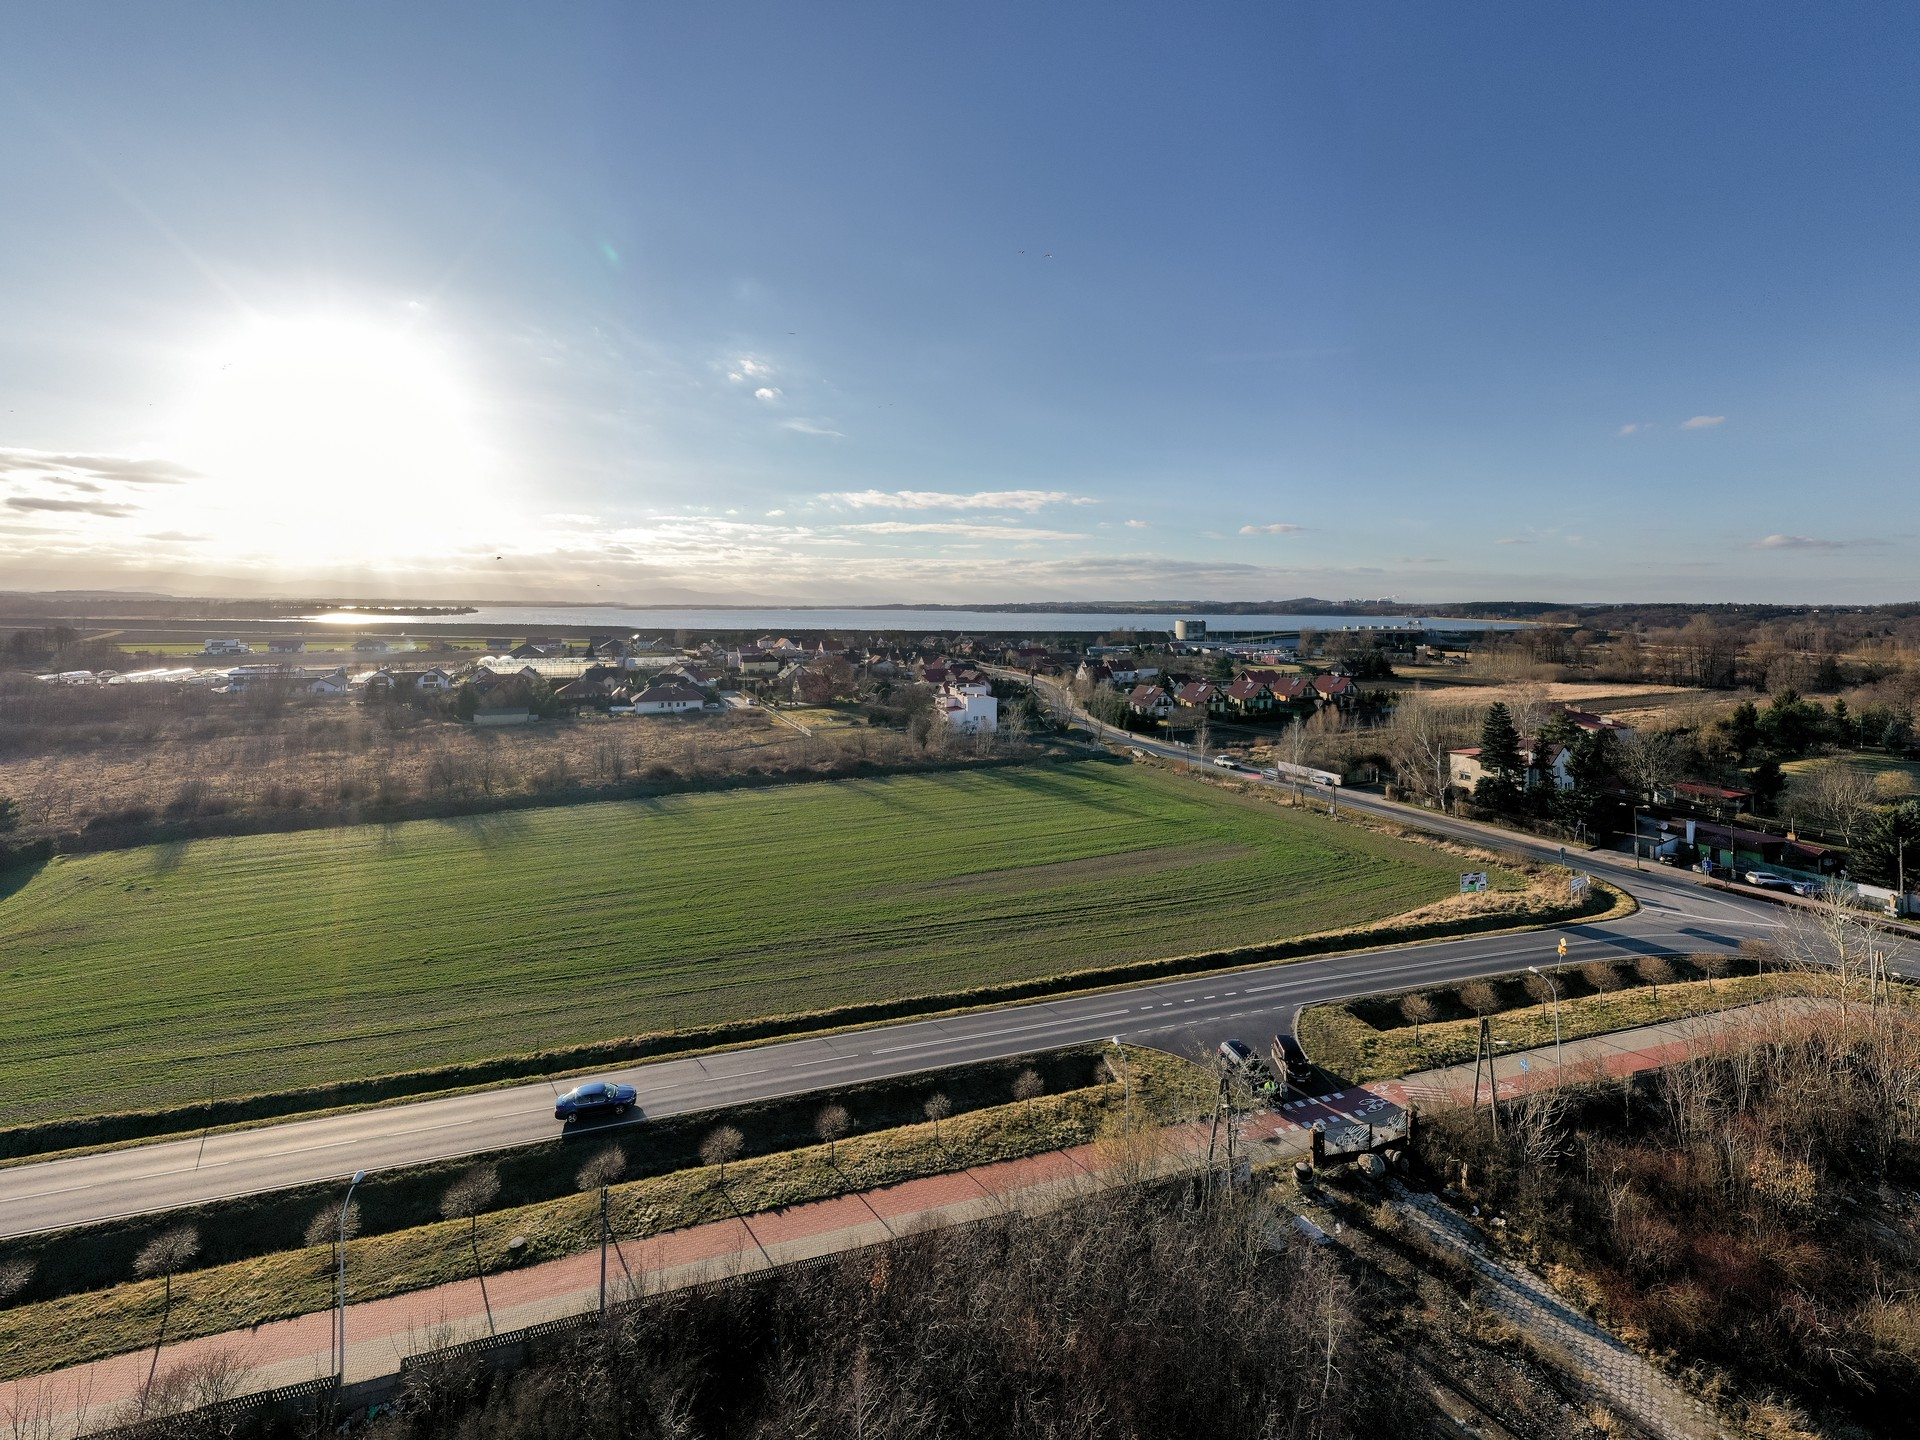 Belweder Park Nysa Zdjecia z Drona 20.02.2020 9